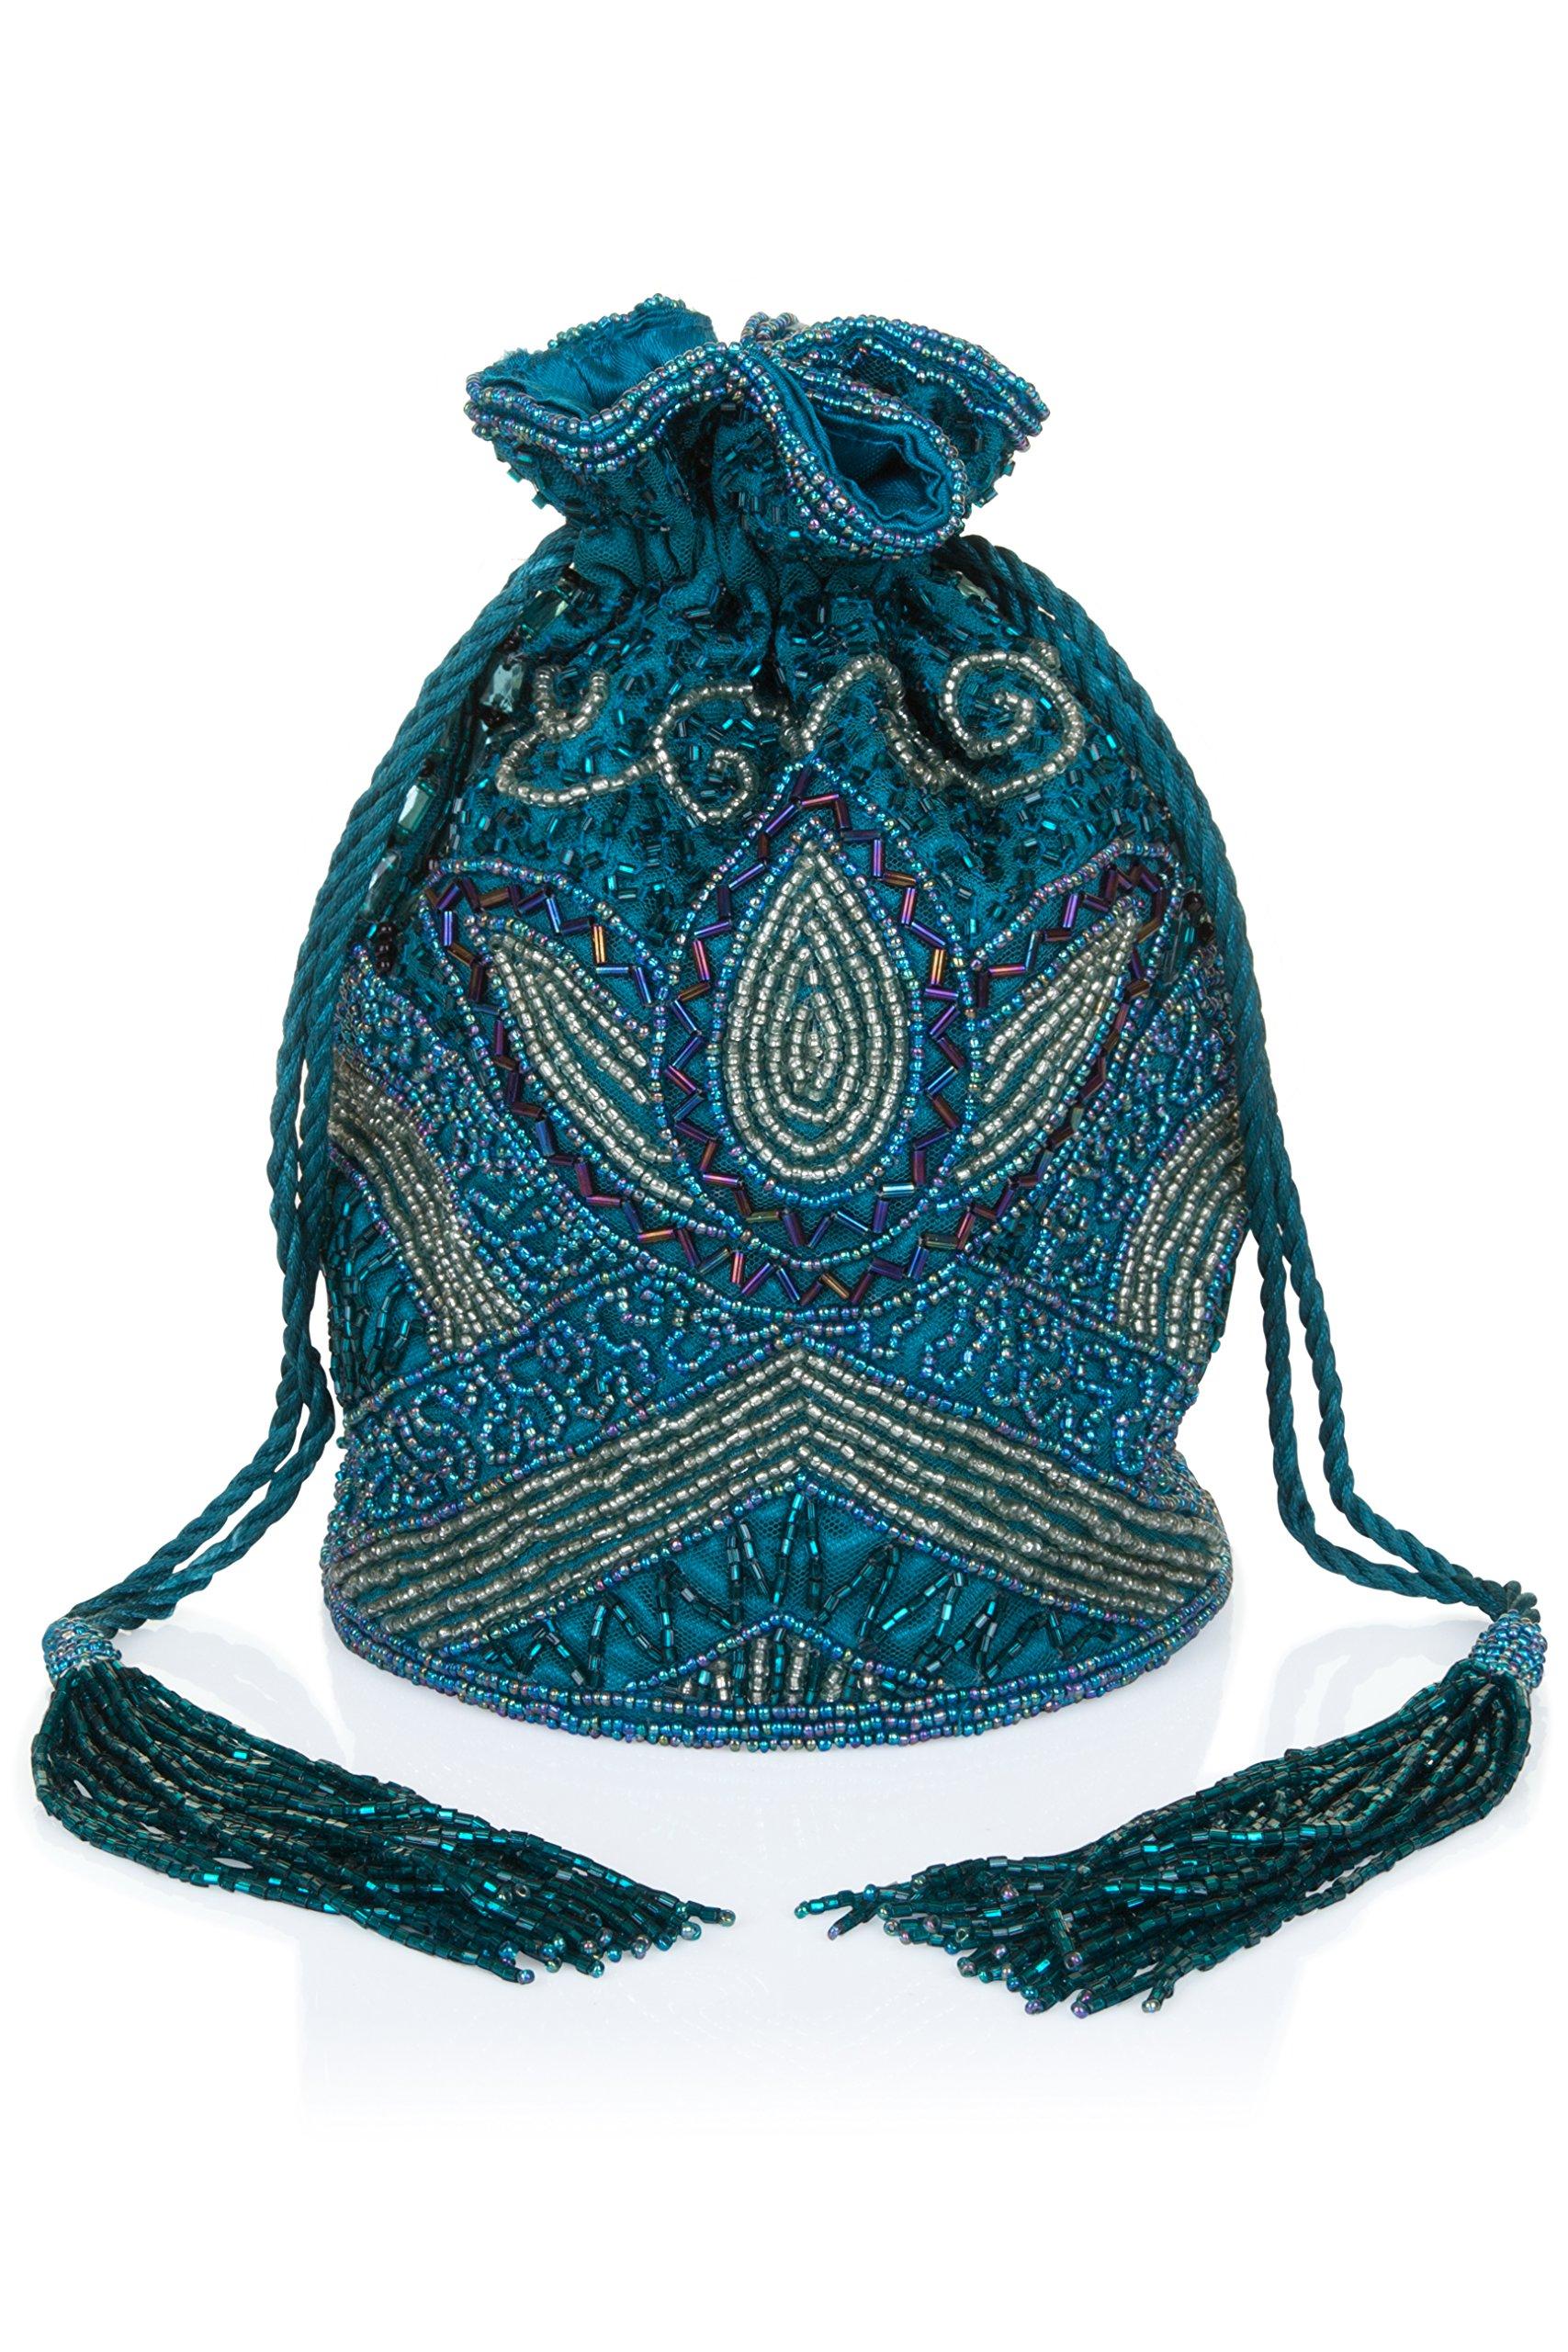 Beatrice Vintage Inspired Hand Embellished Bucket Bag in Teal